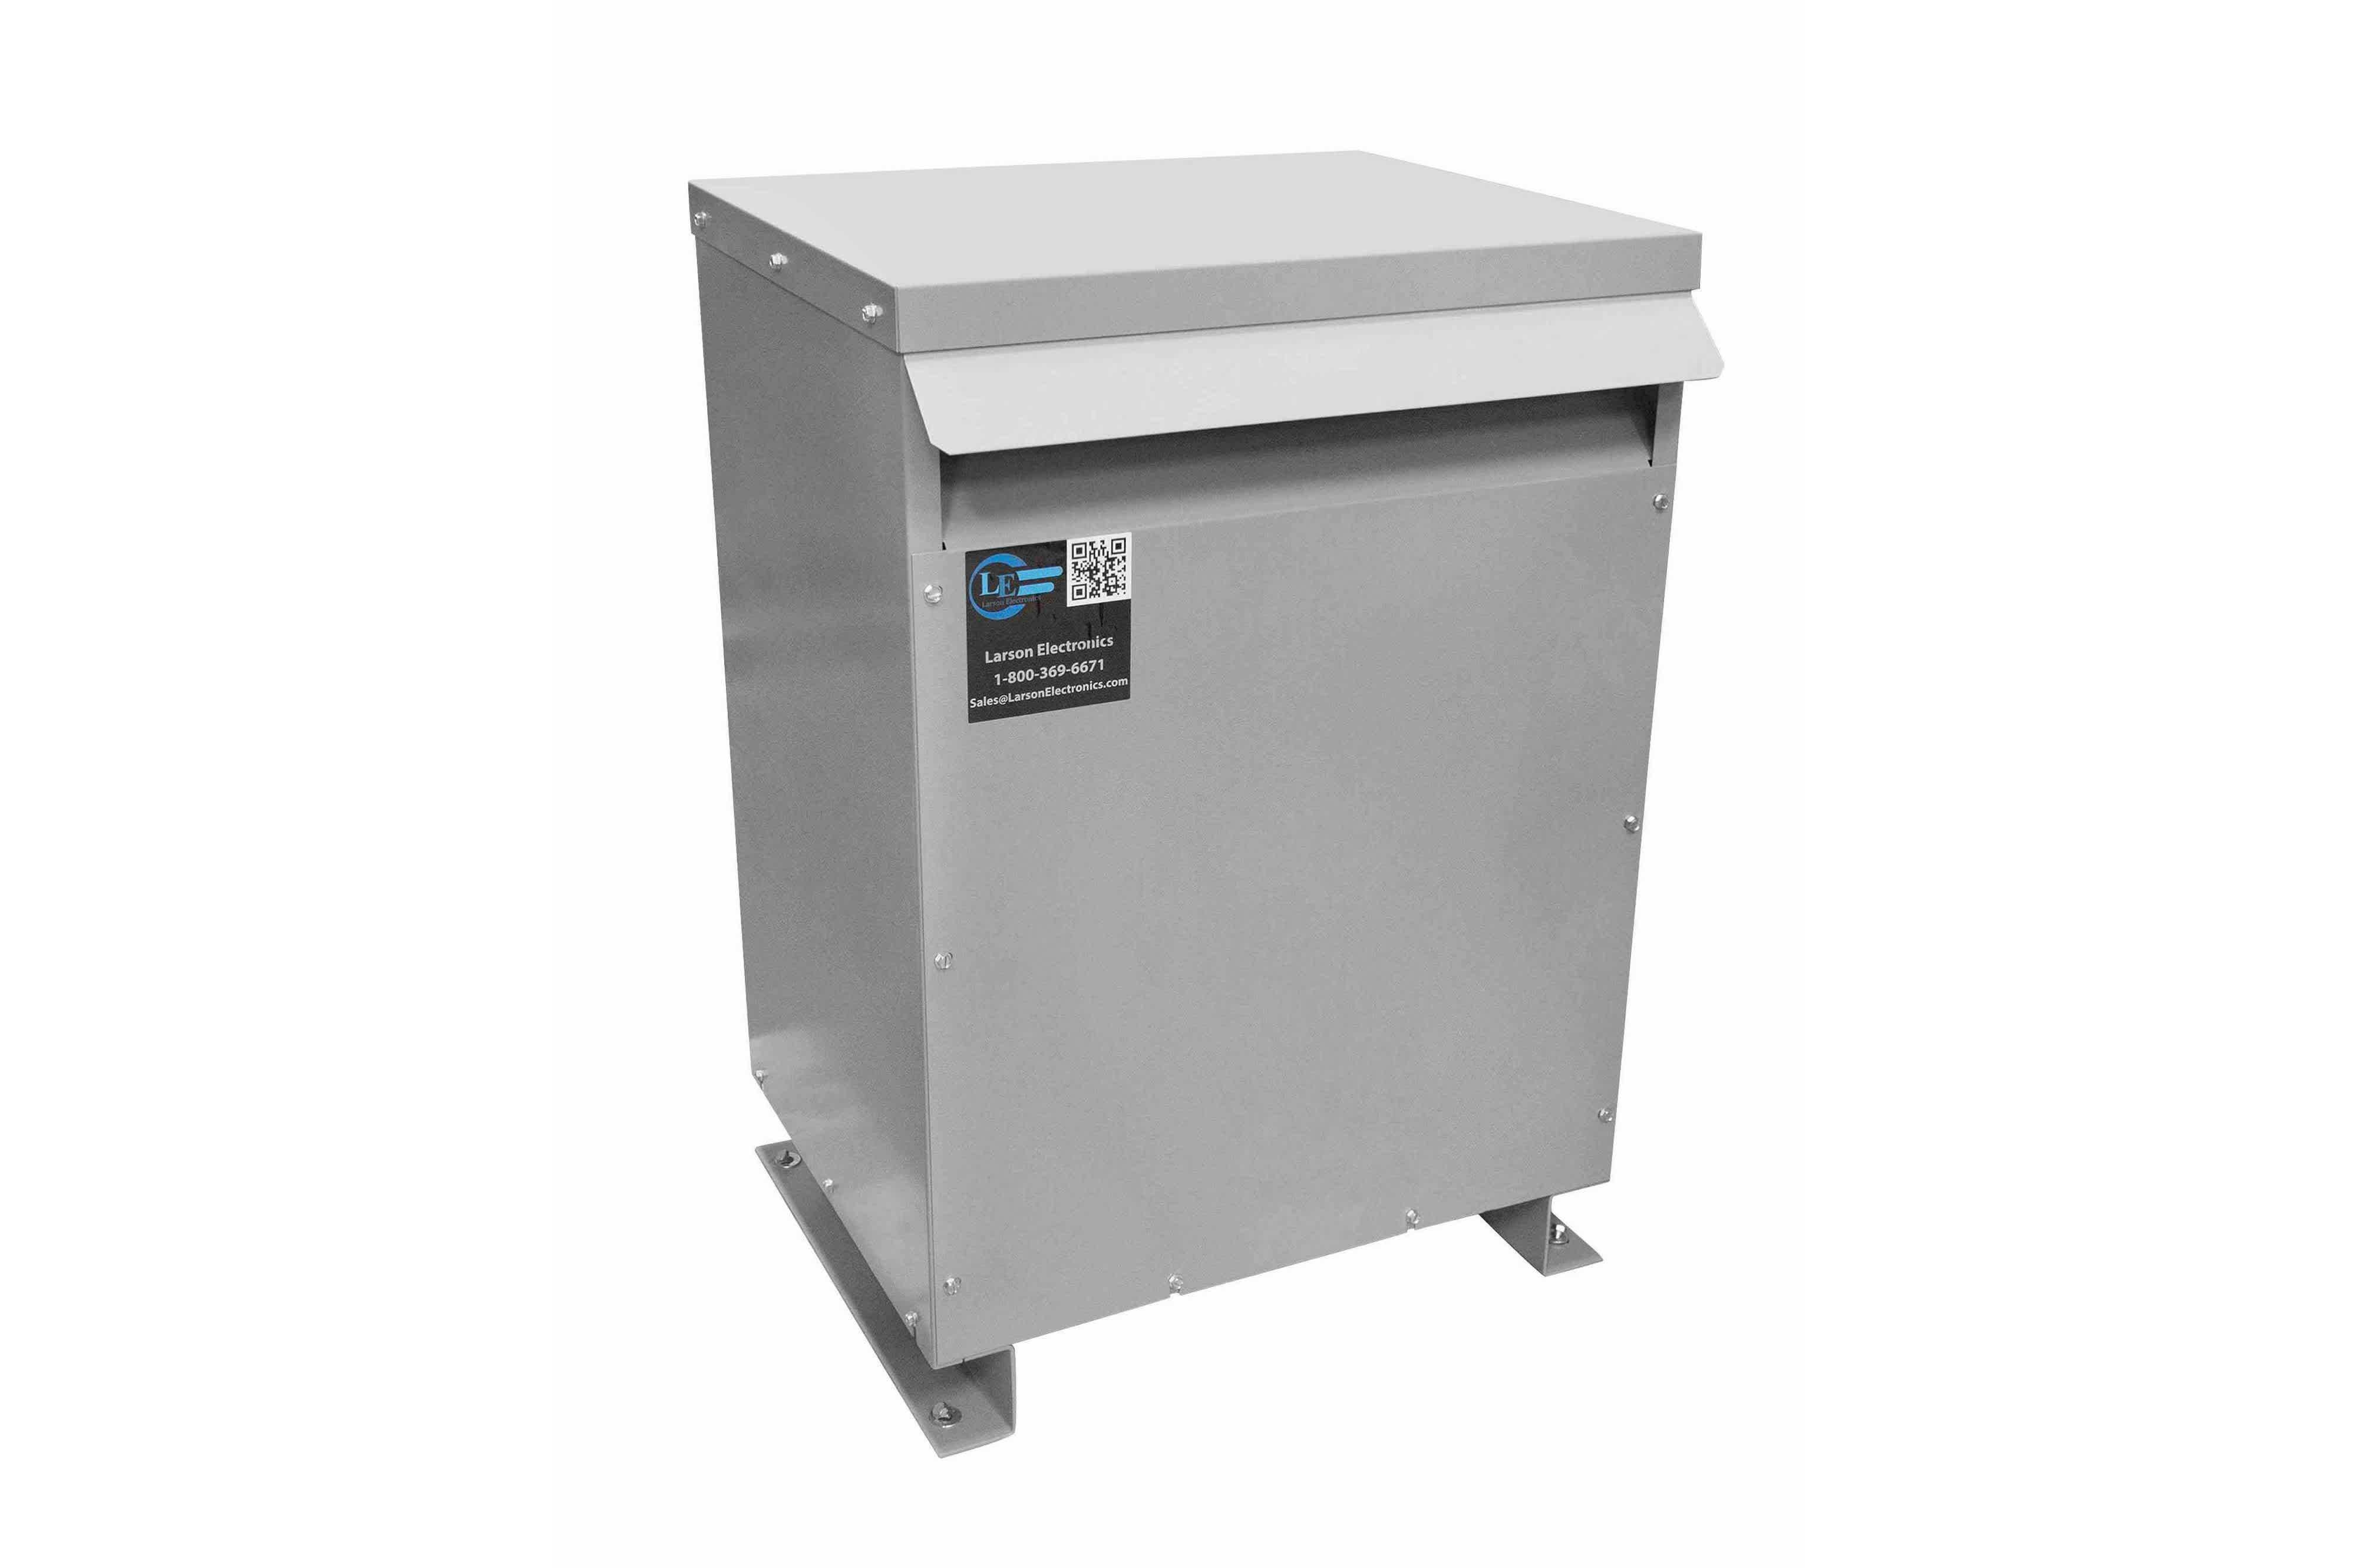 250 kVA 3PH Isolation Transformer, 460V Wye Primary, 208Y/120 Wye-N Secondary, N3R, Ventilated, 60 Hz